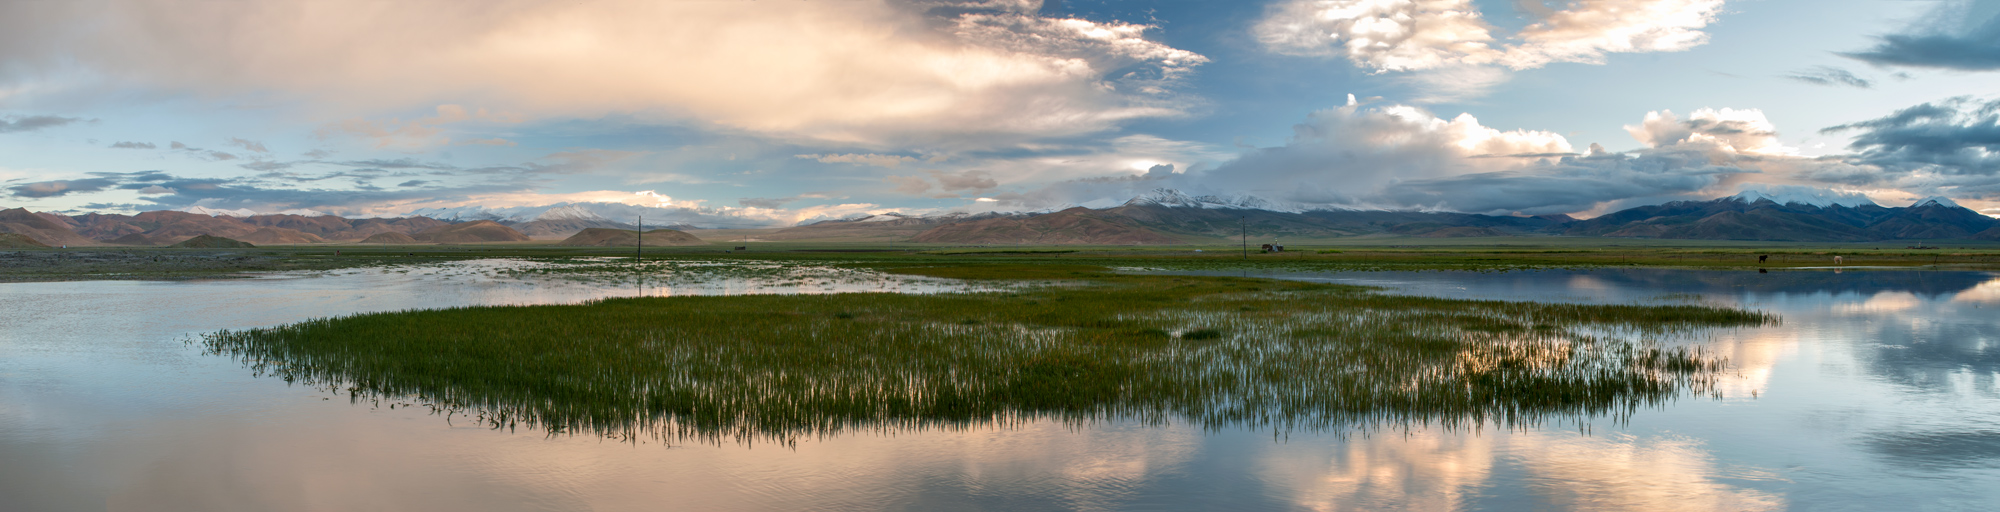 Долина Чангтан Тибет.